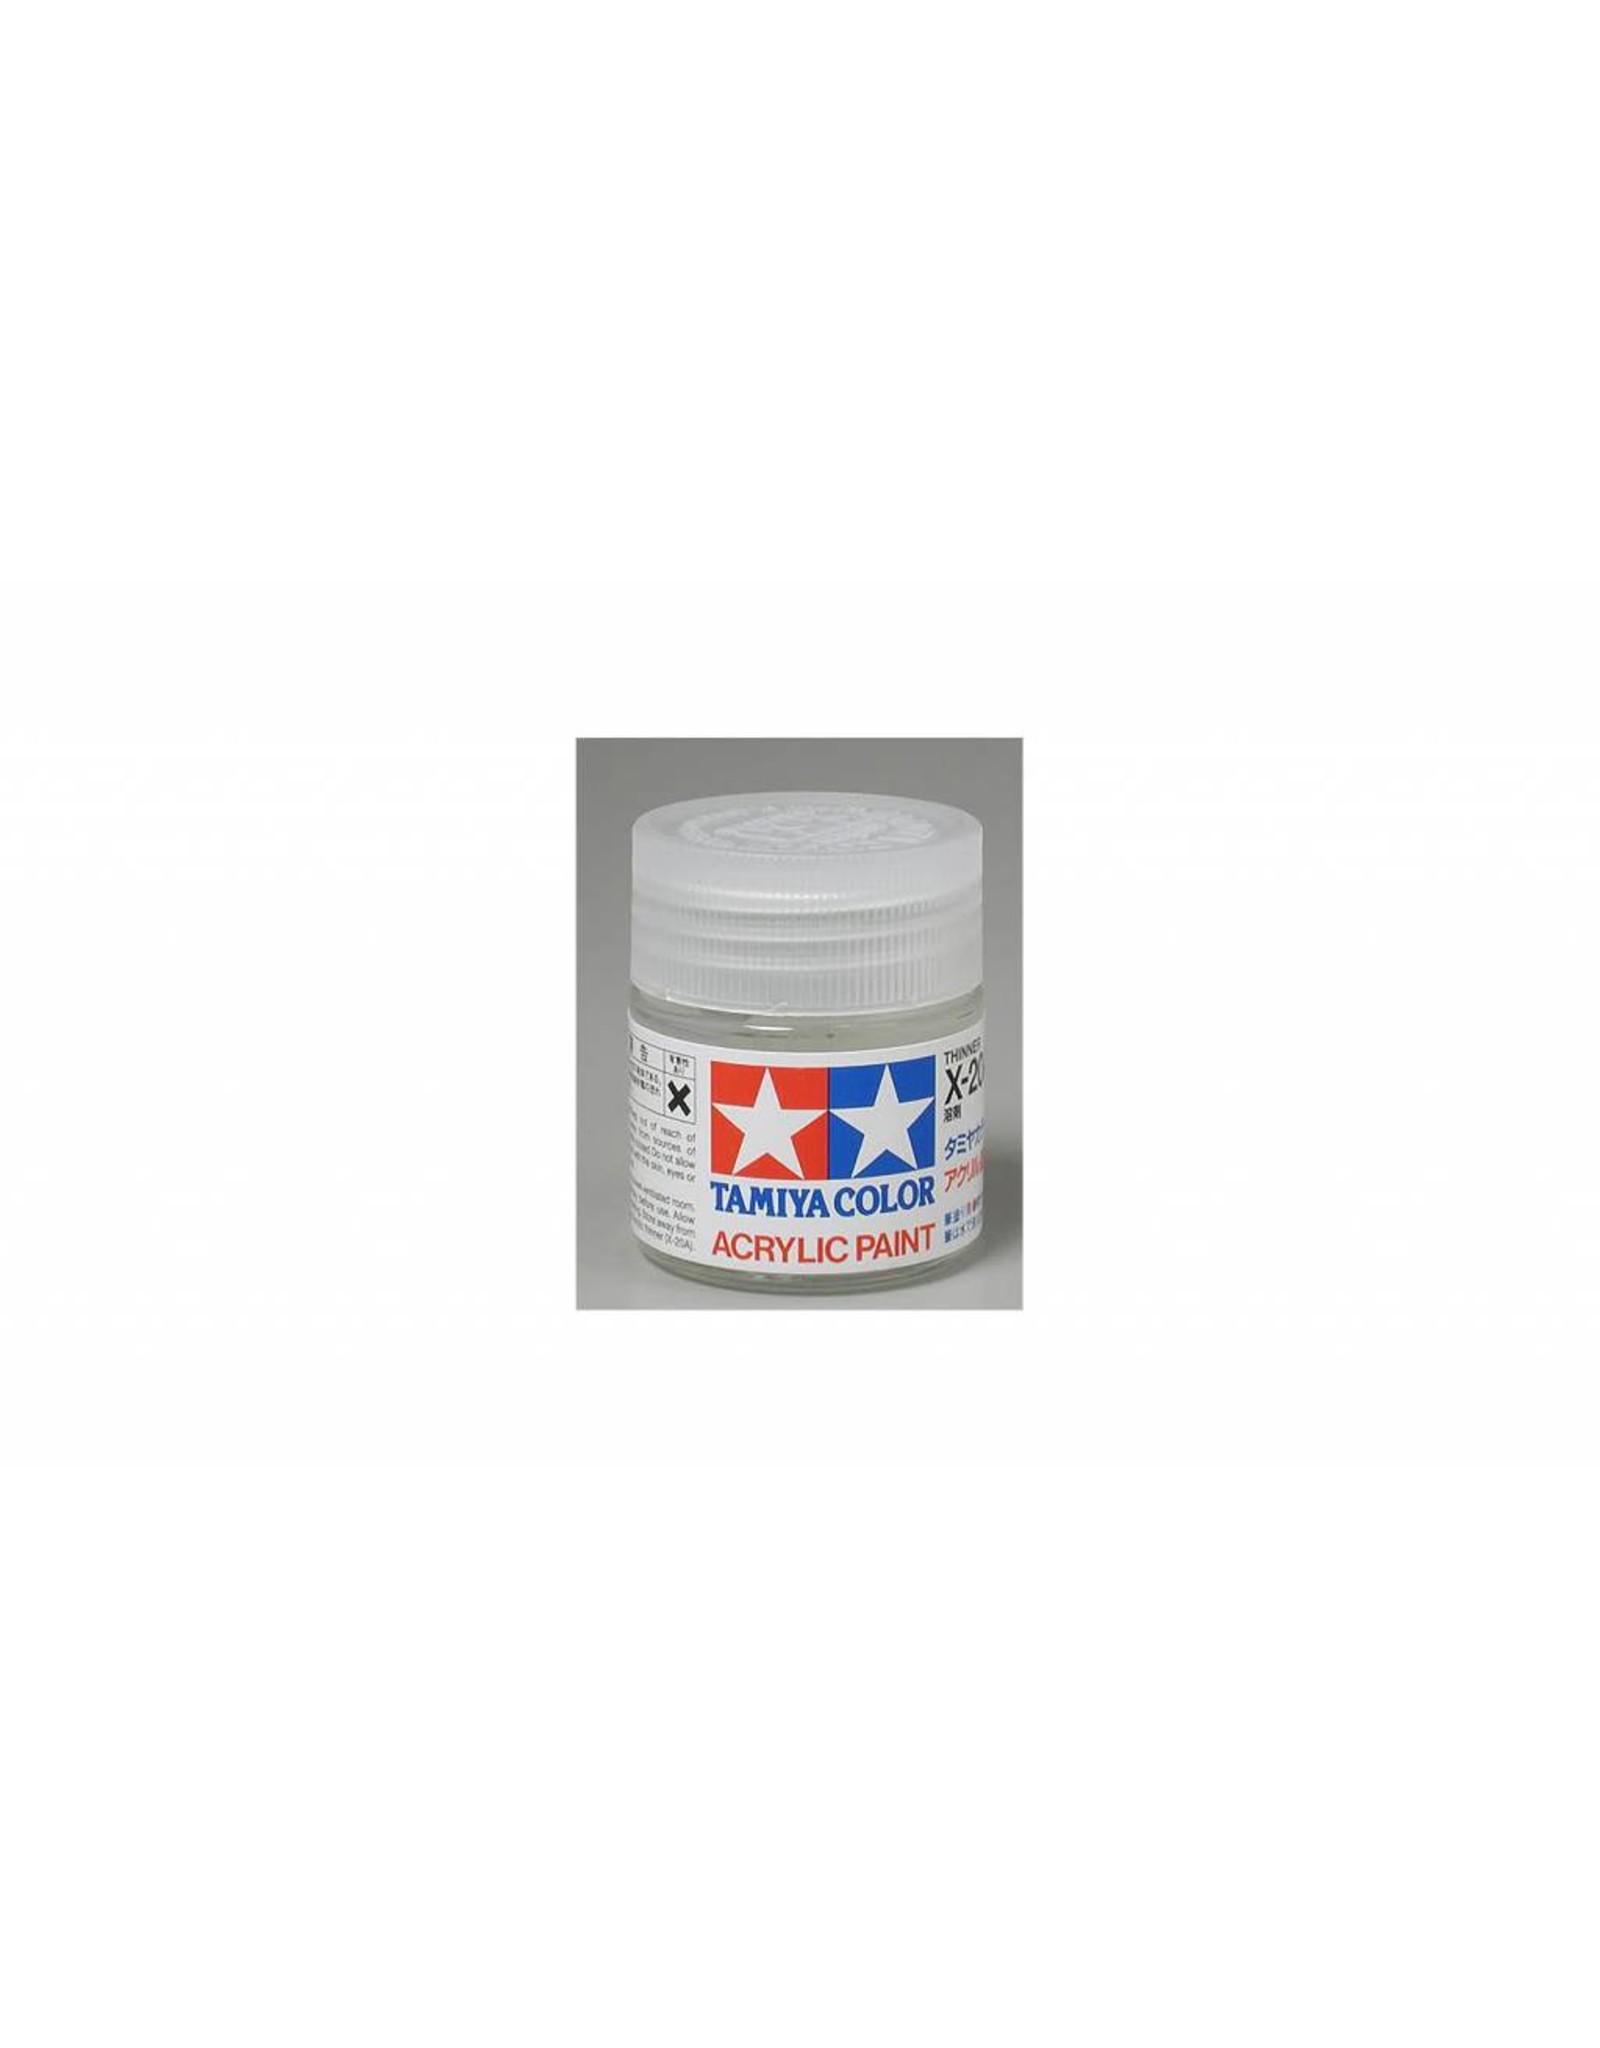 Tamiya Acrylic/Poly Thinner X-20A 23ml